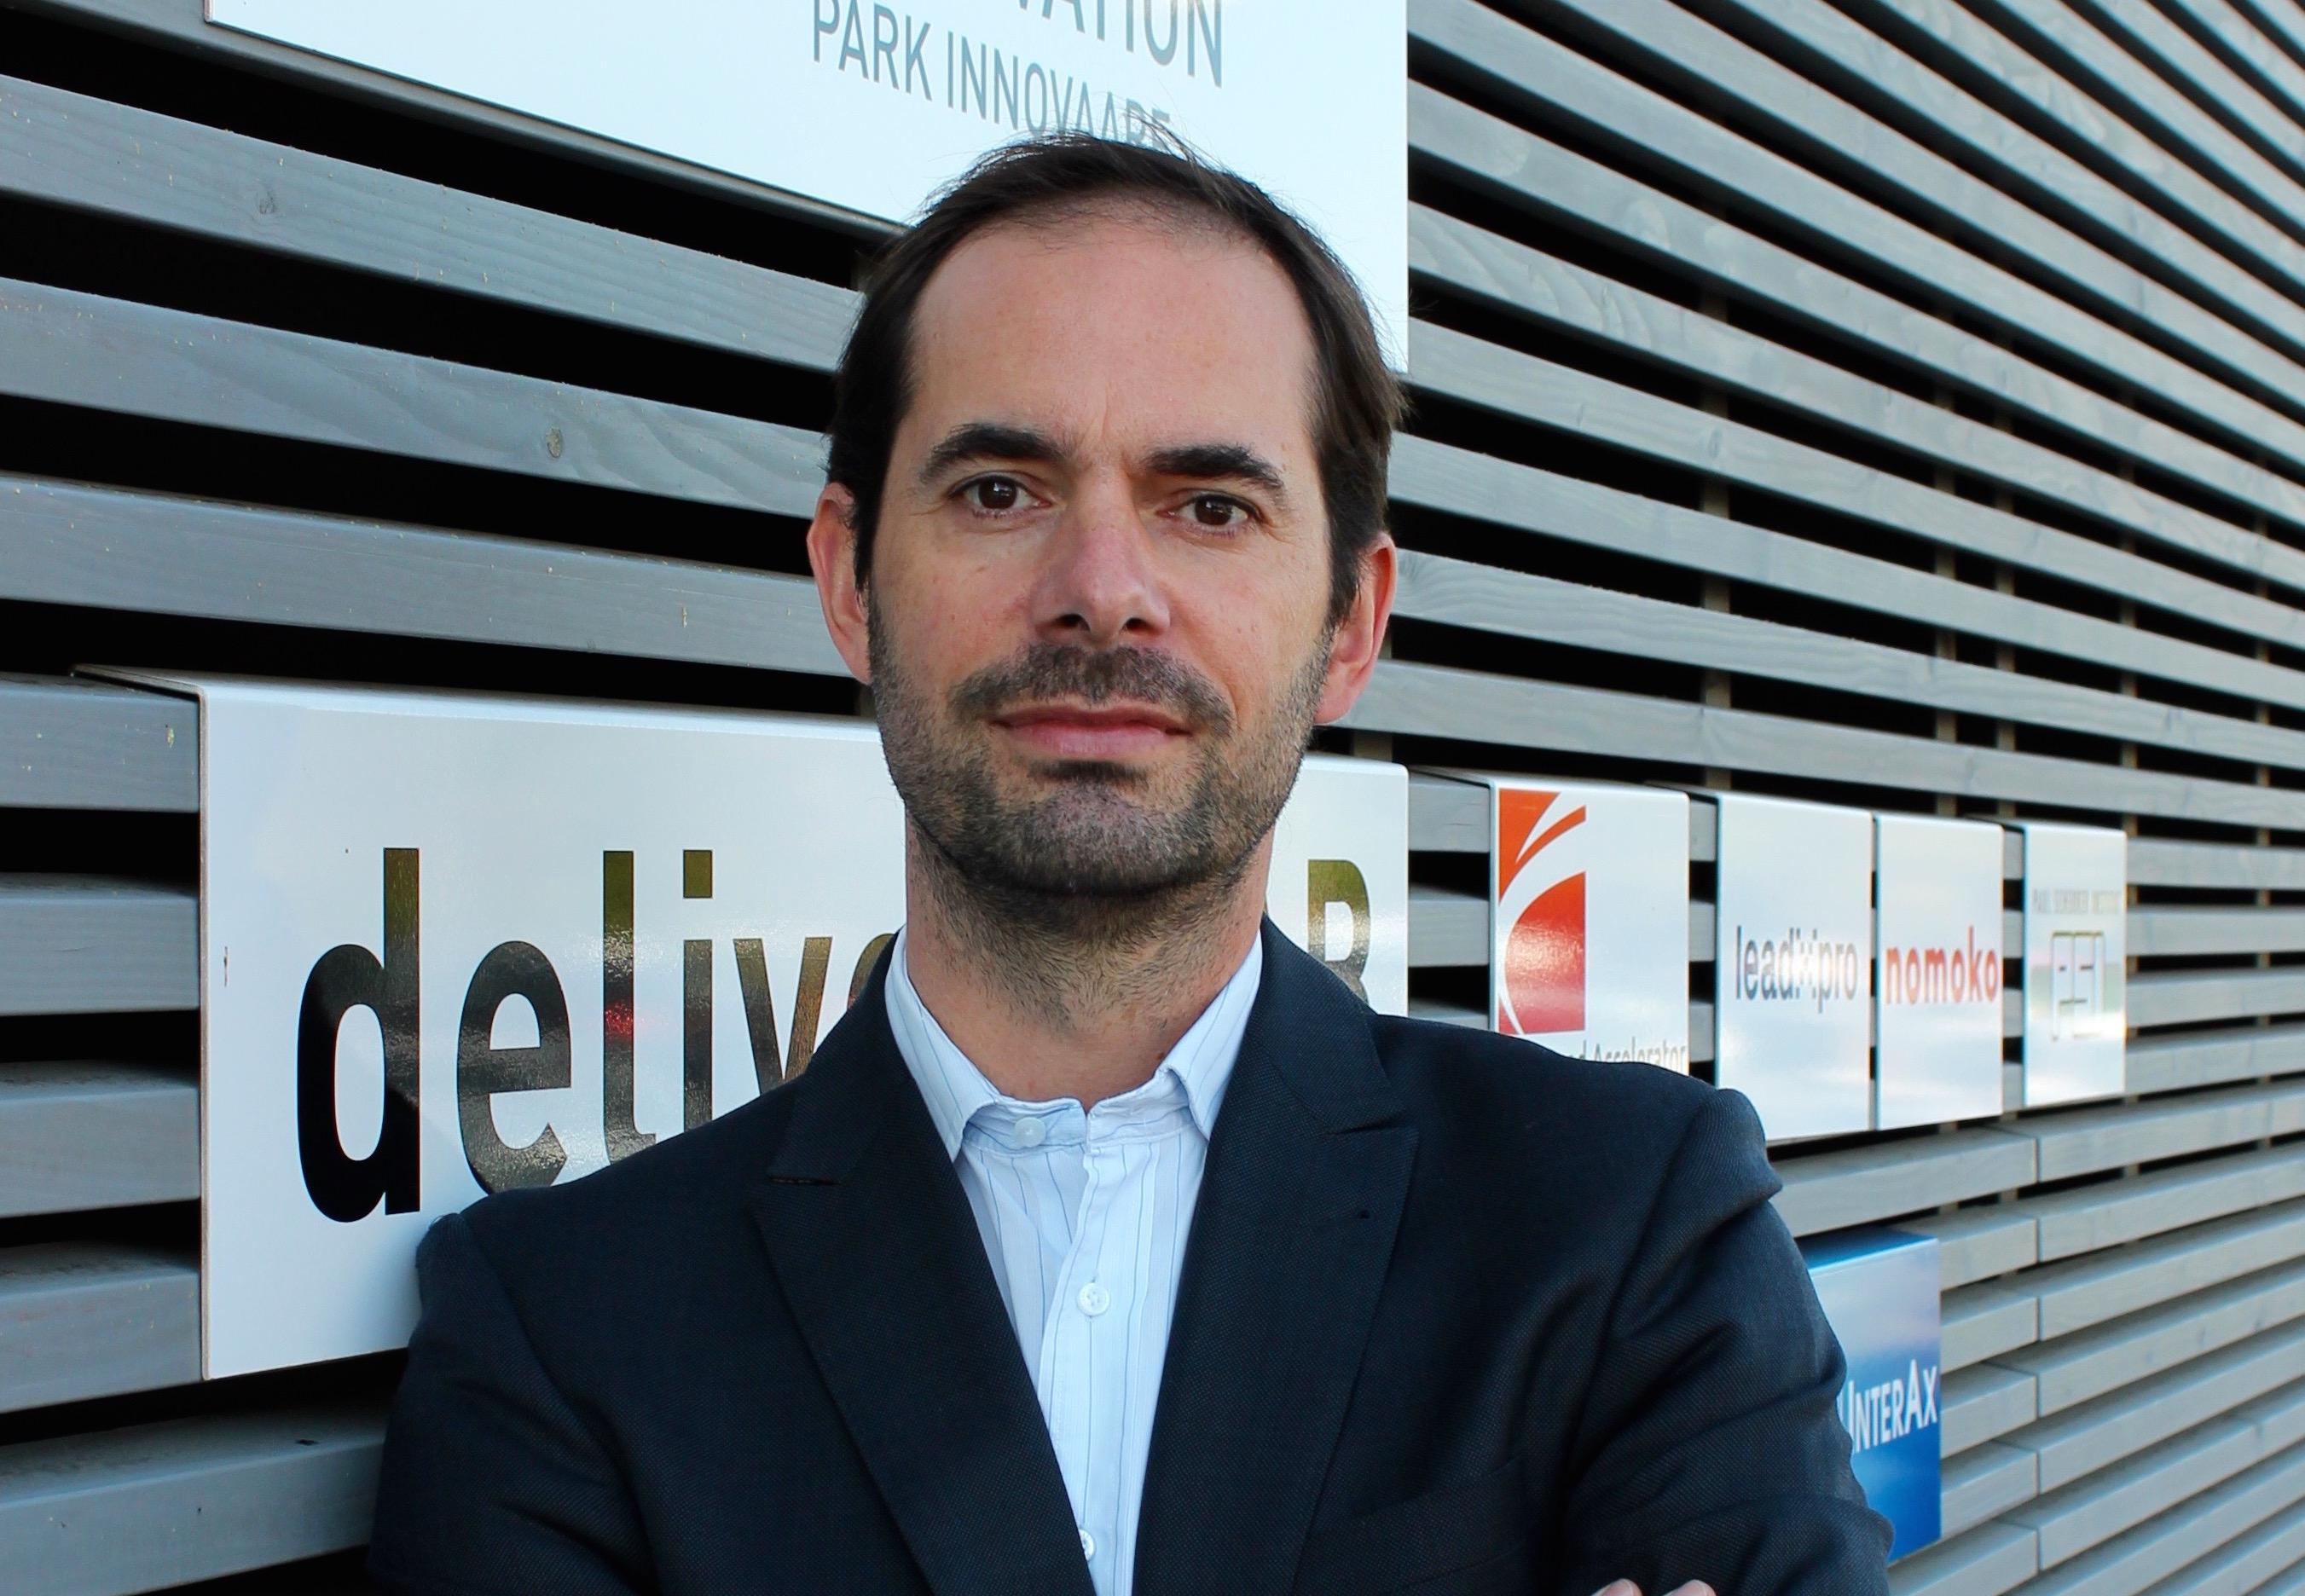 Nils Gebhardt, Managing Director PARK INNOVAARE